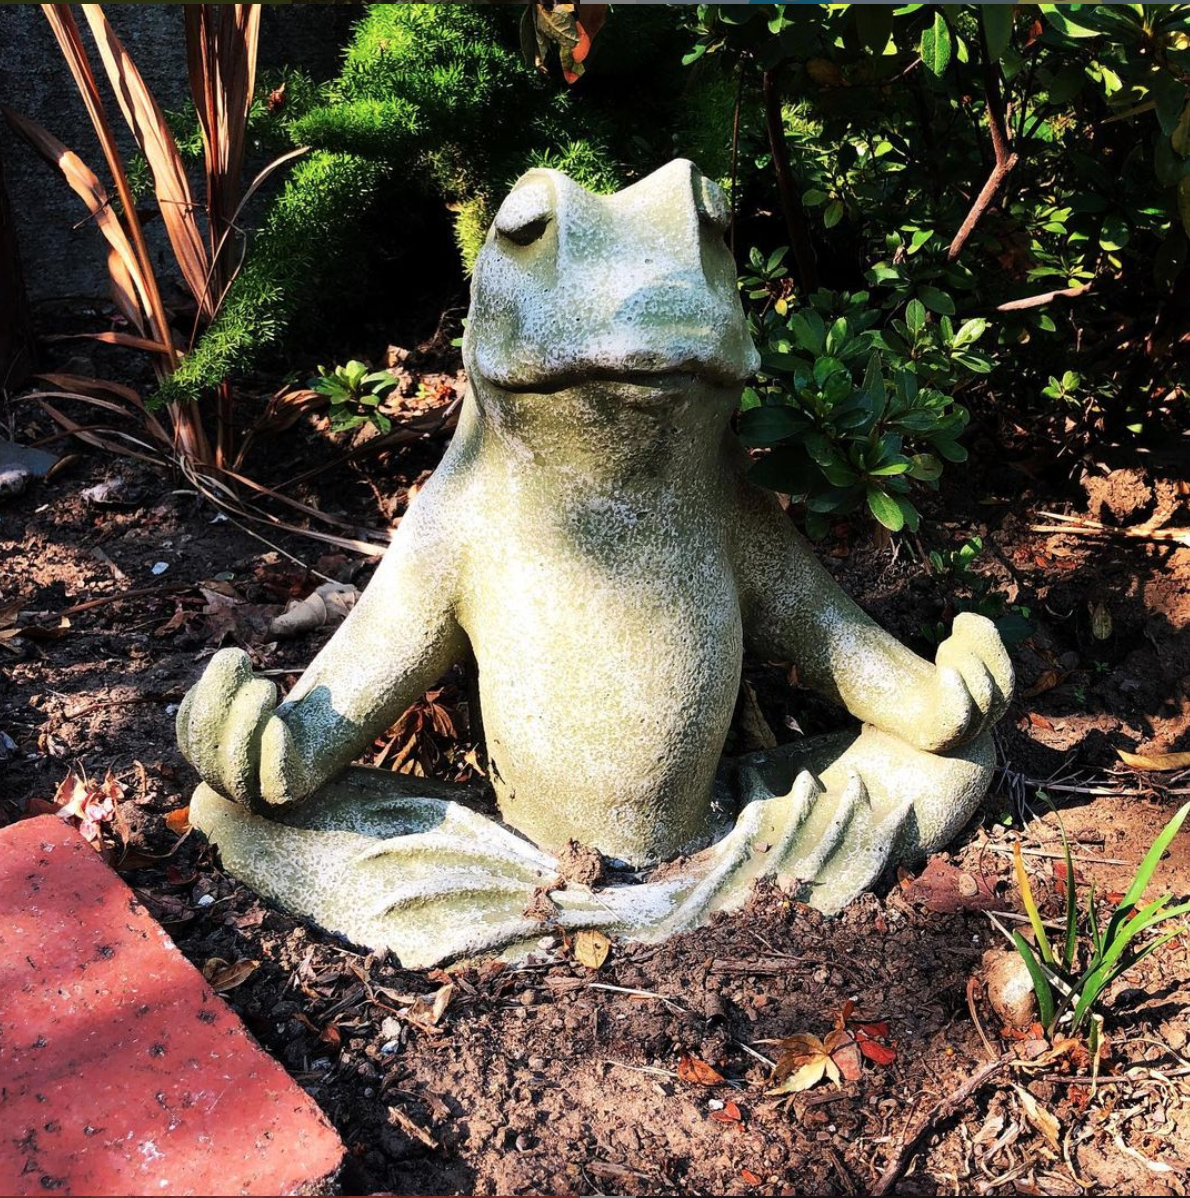 A meditating frog